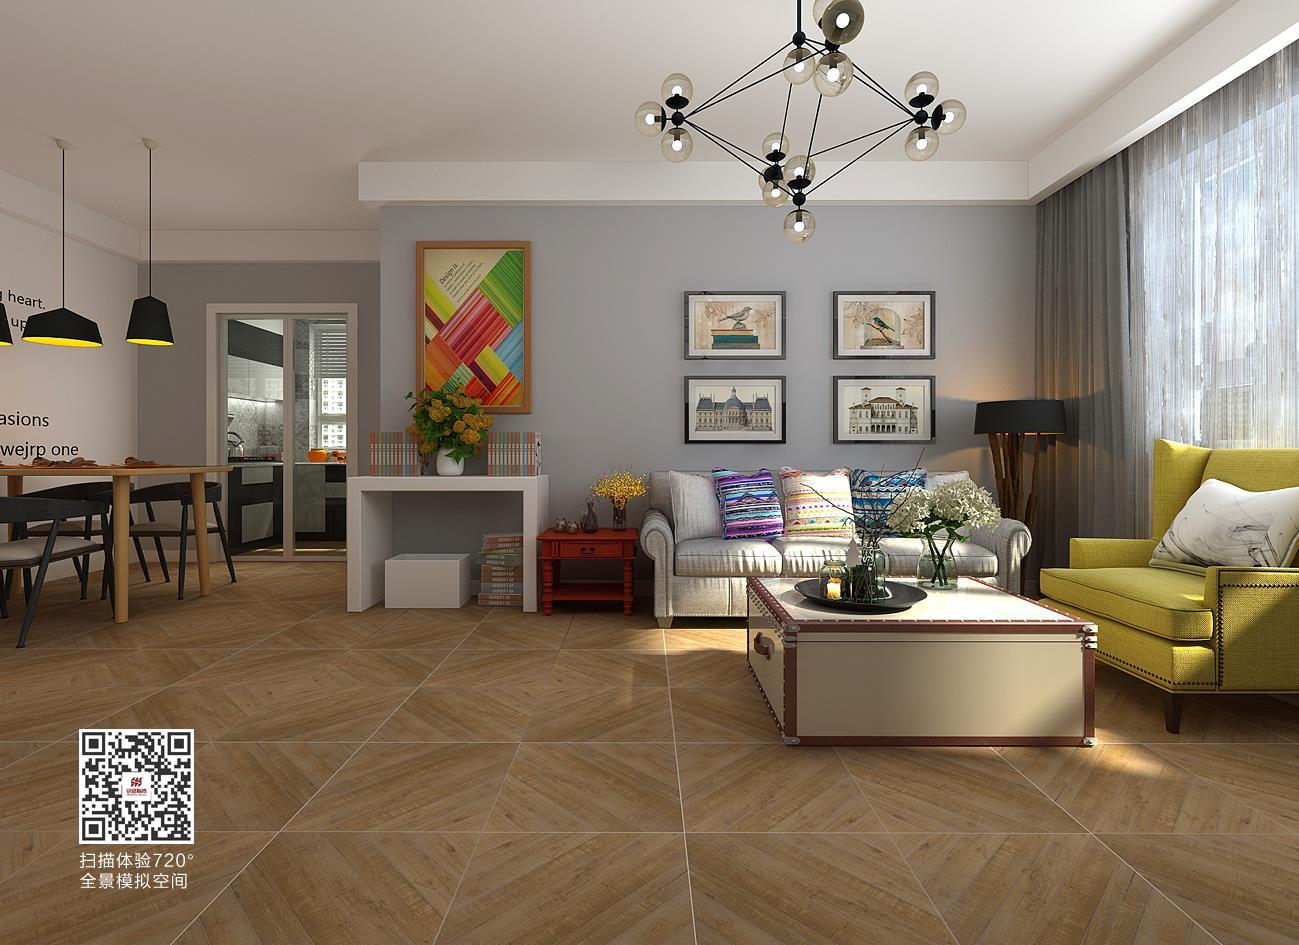 500x500mm木纹砖